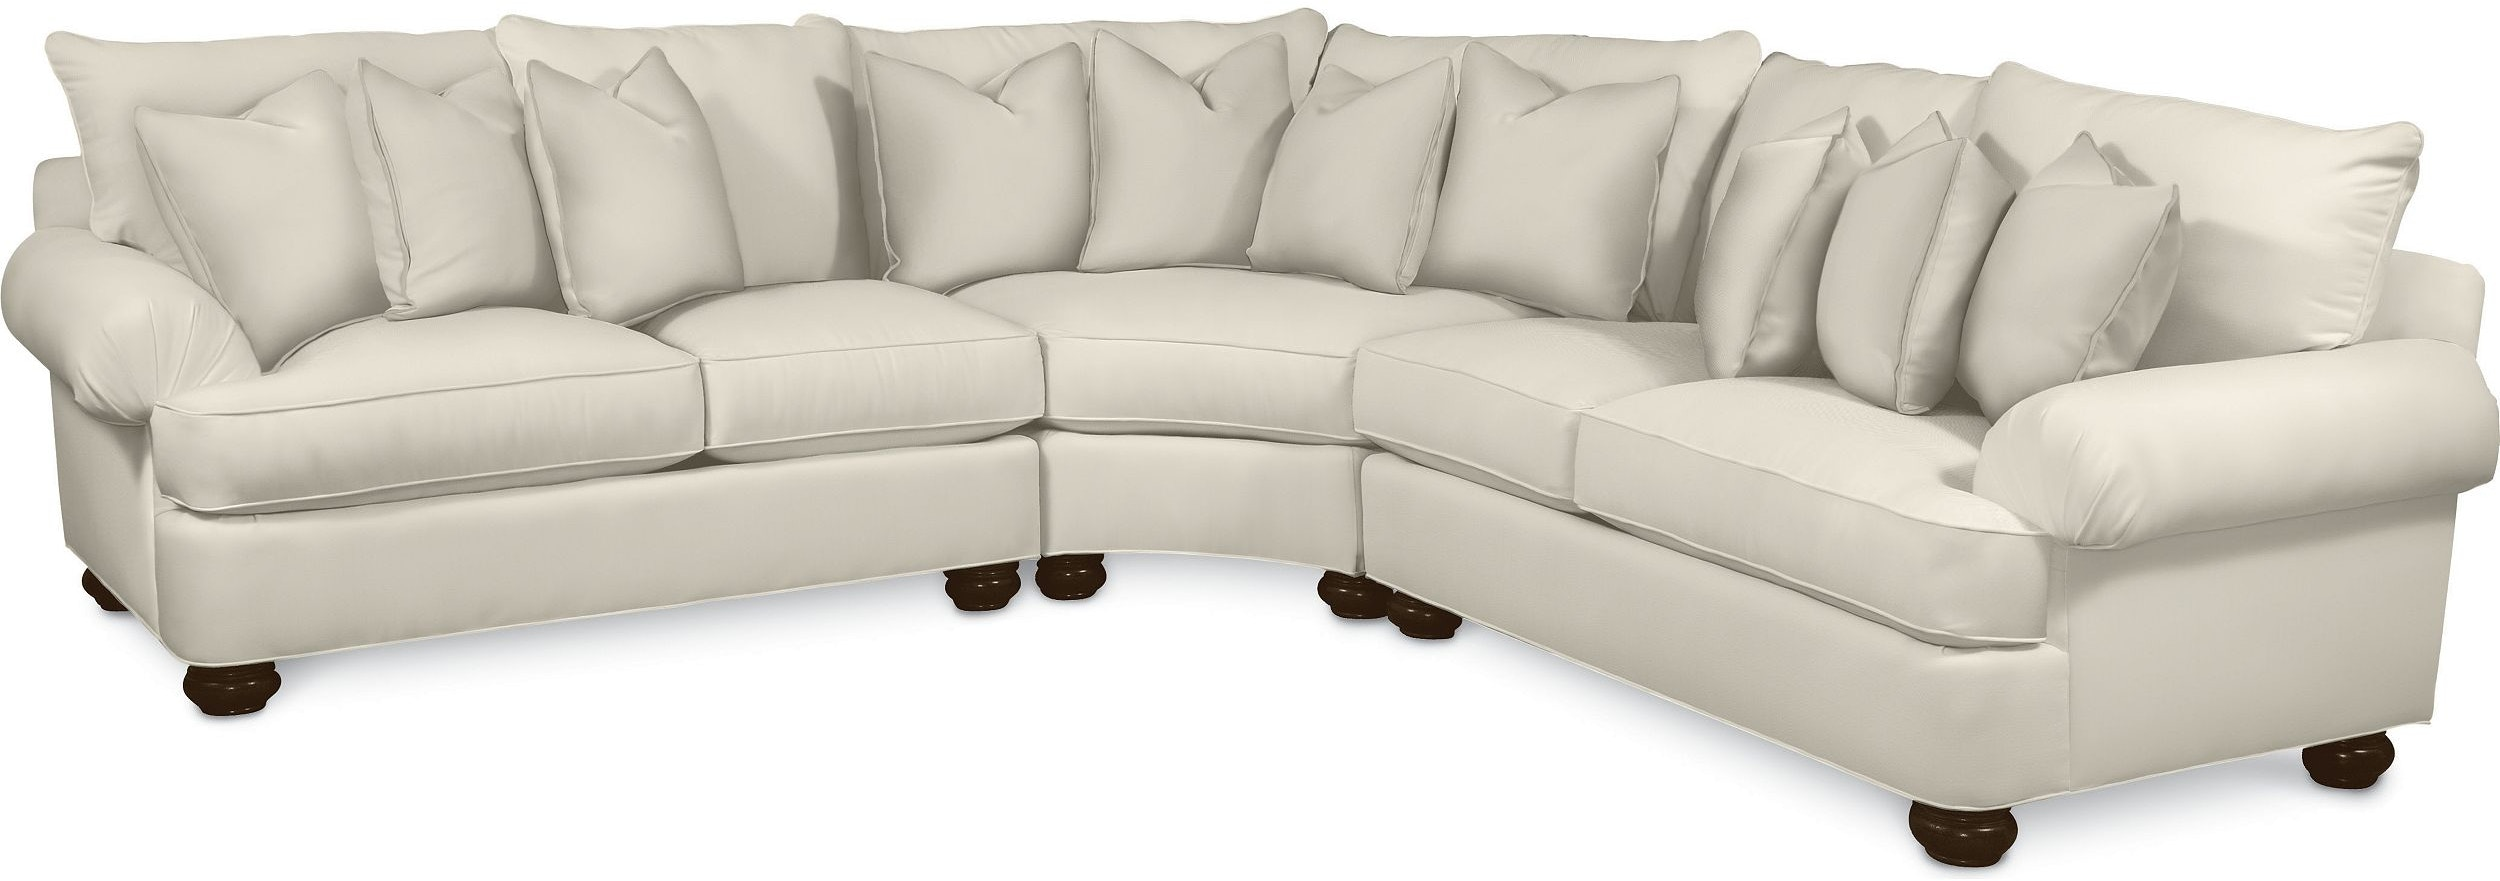 Thomasville Furniture 8104 SECT Living Room Portofino Sectional